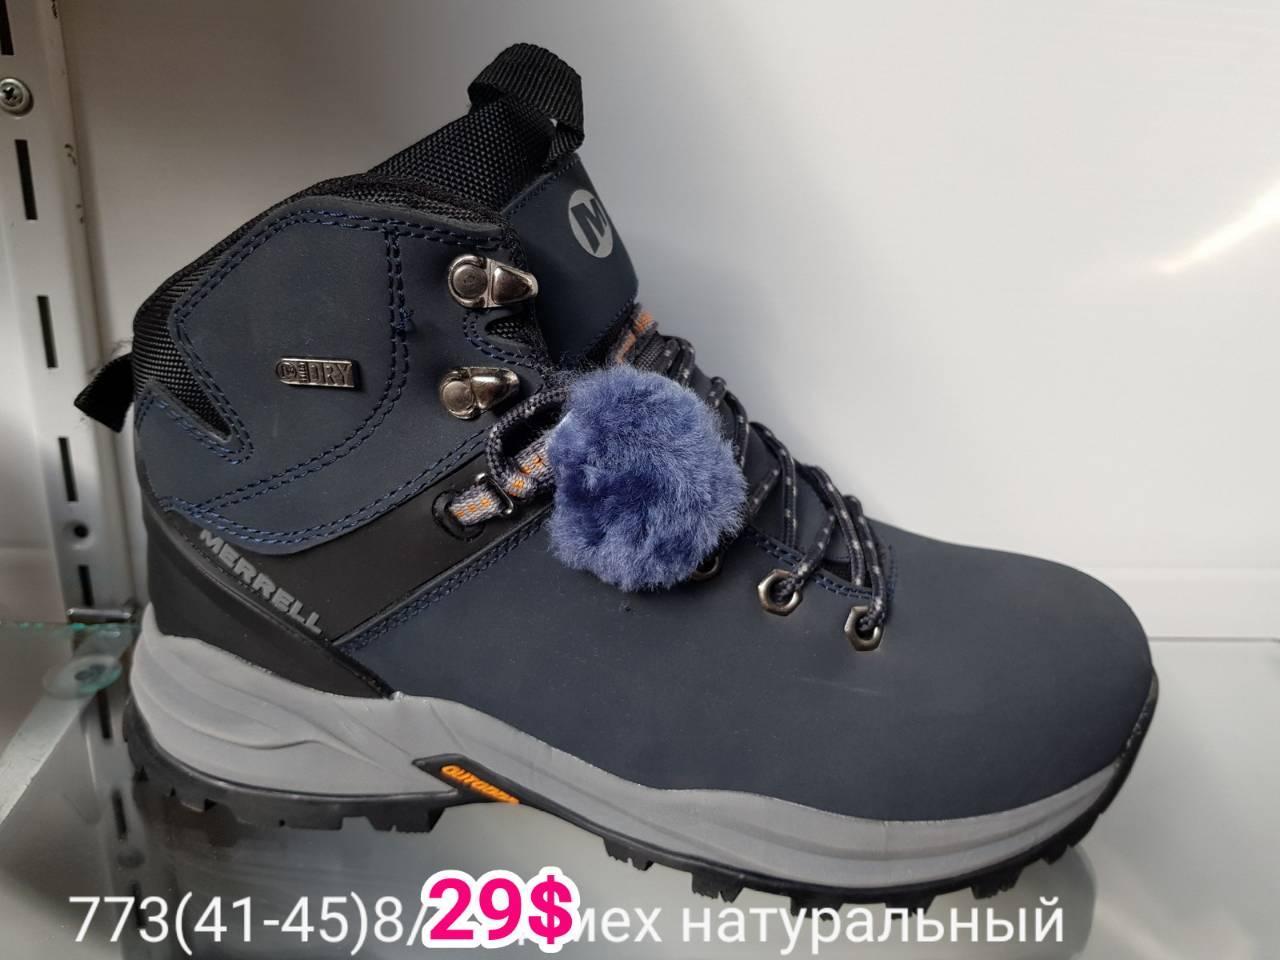 Мужские ботинки Merrell оптом (41-45)